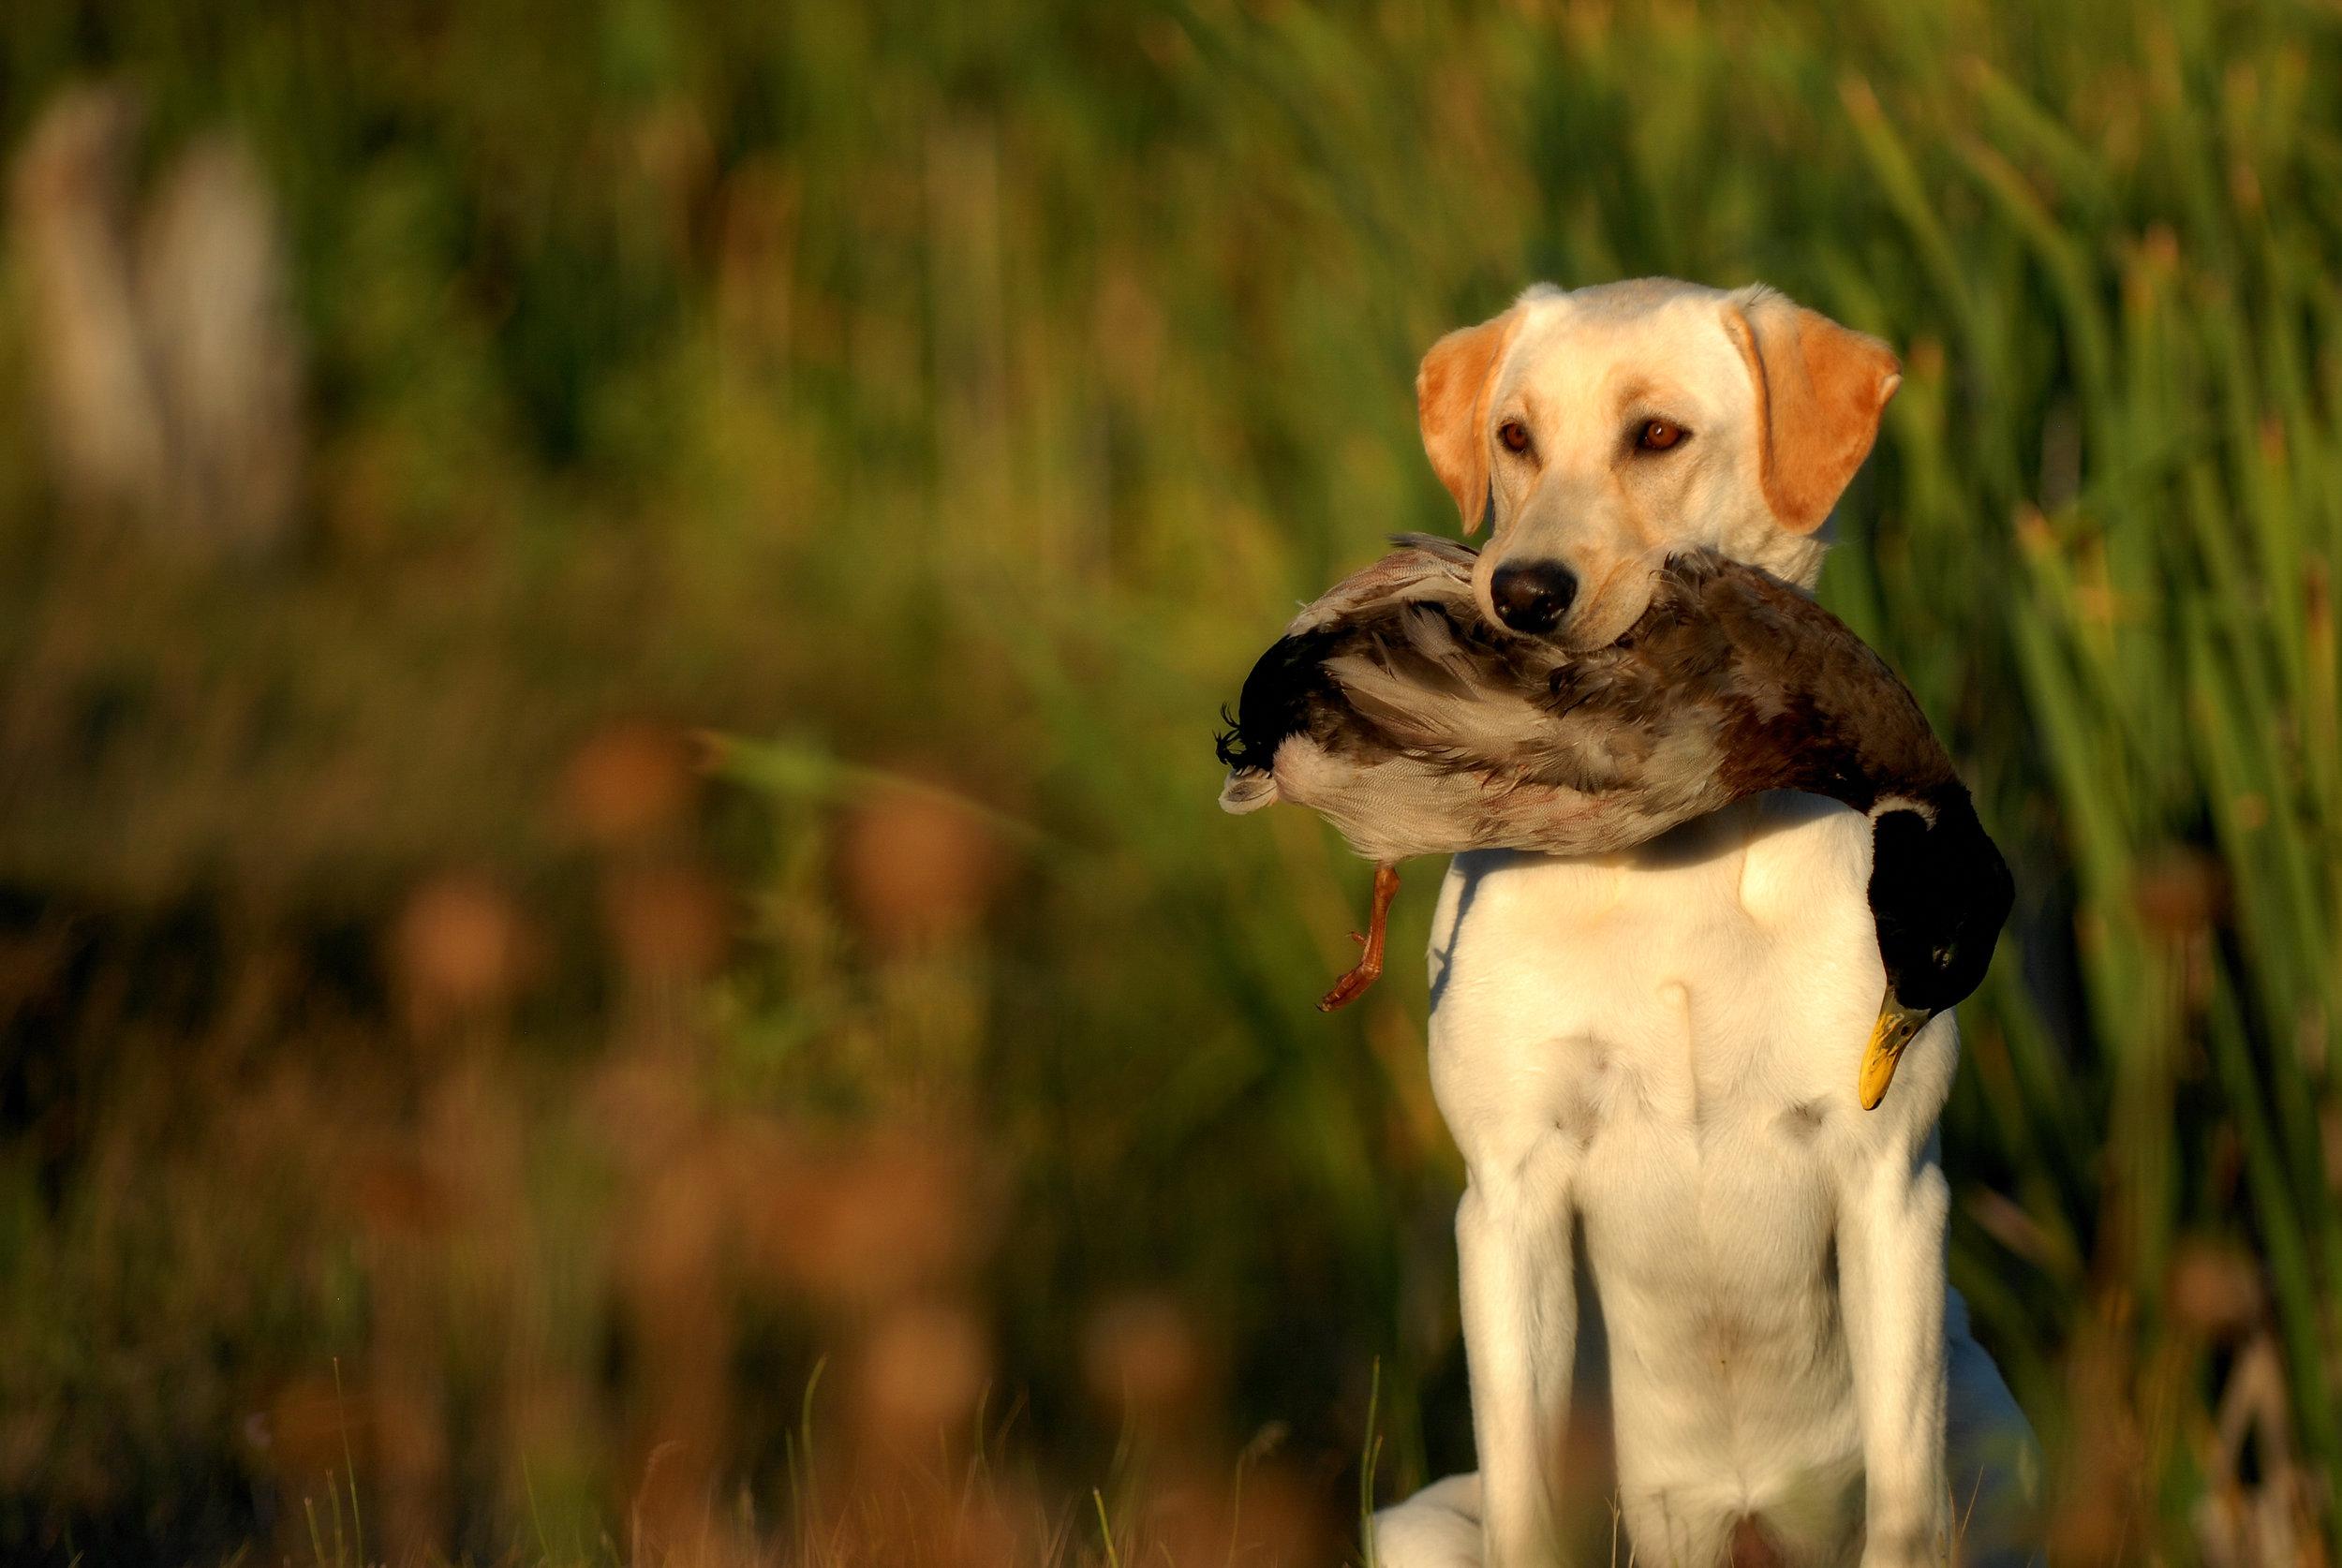 Yellow-Labrador-Retriever-Hunting-477849979_3872x2592.jpeg